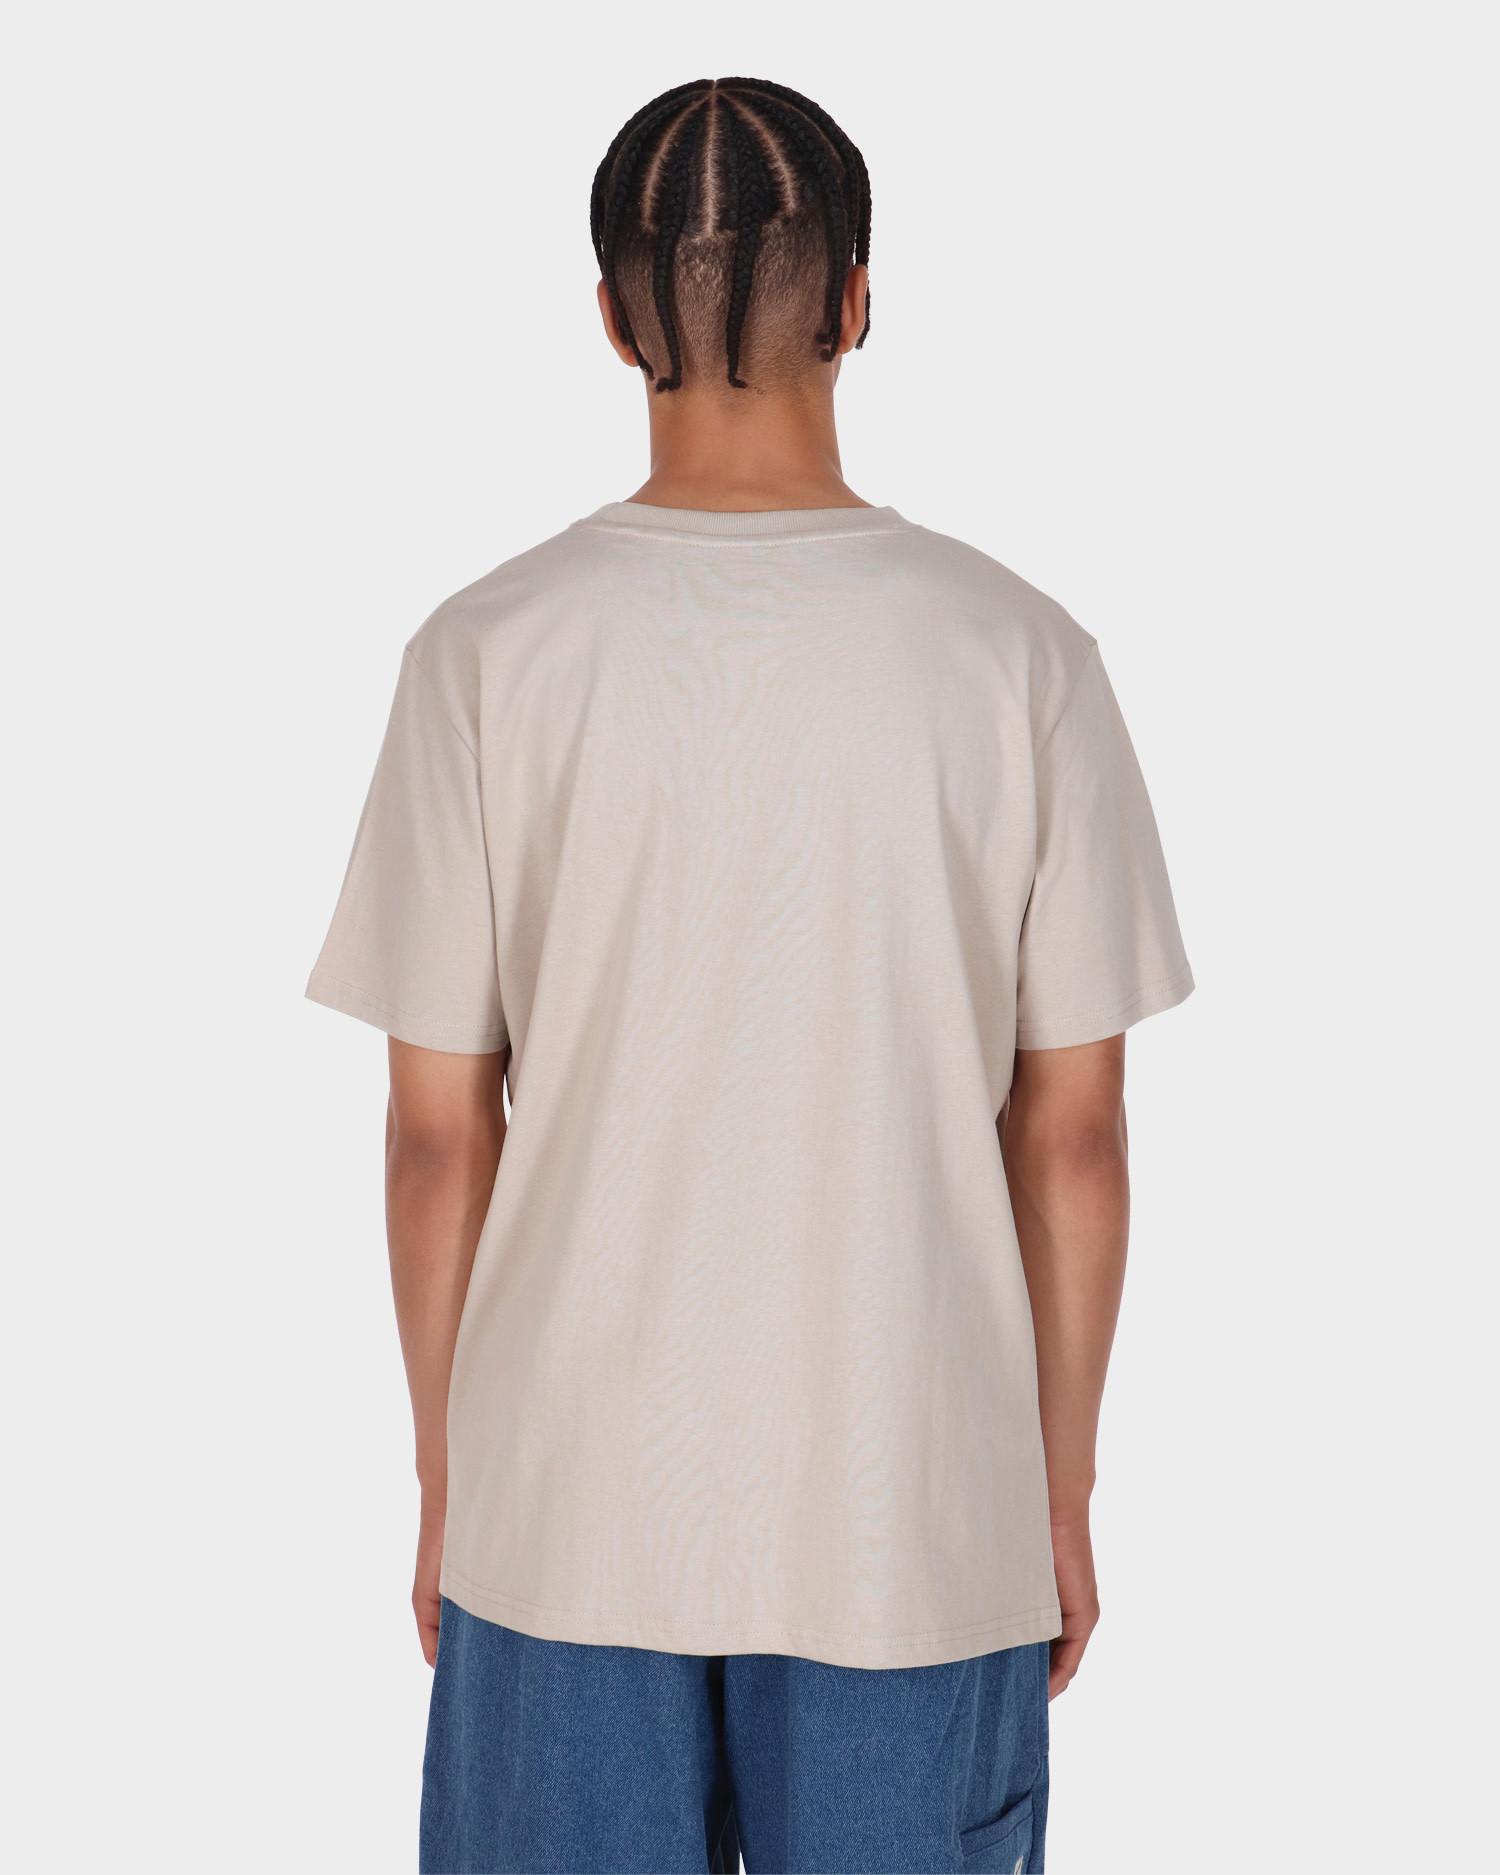 Poetic Collective Half And Half T-shirt Sand